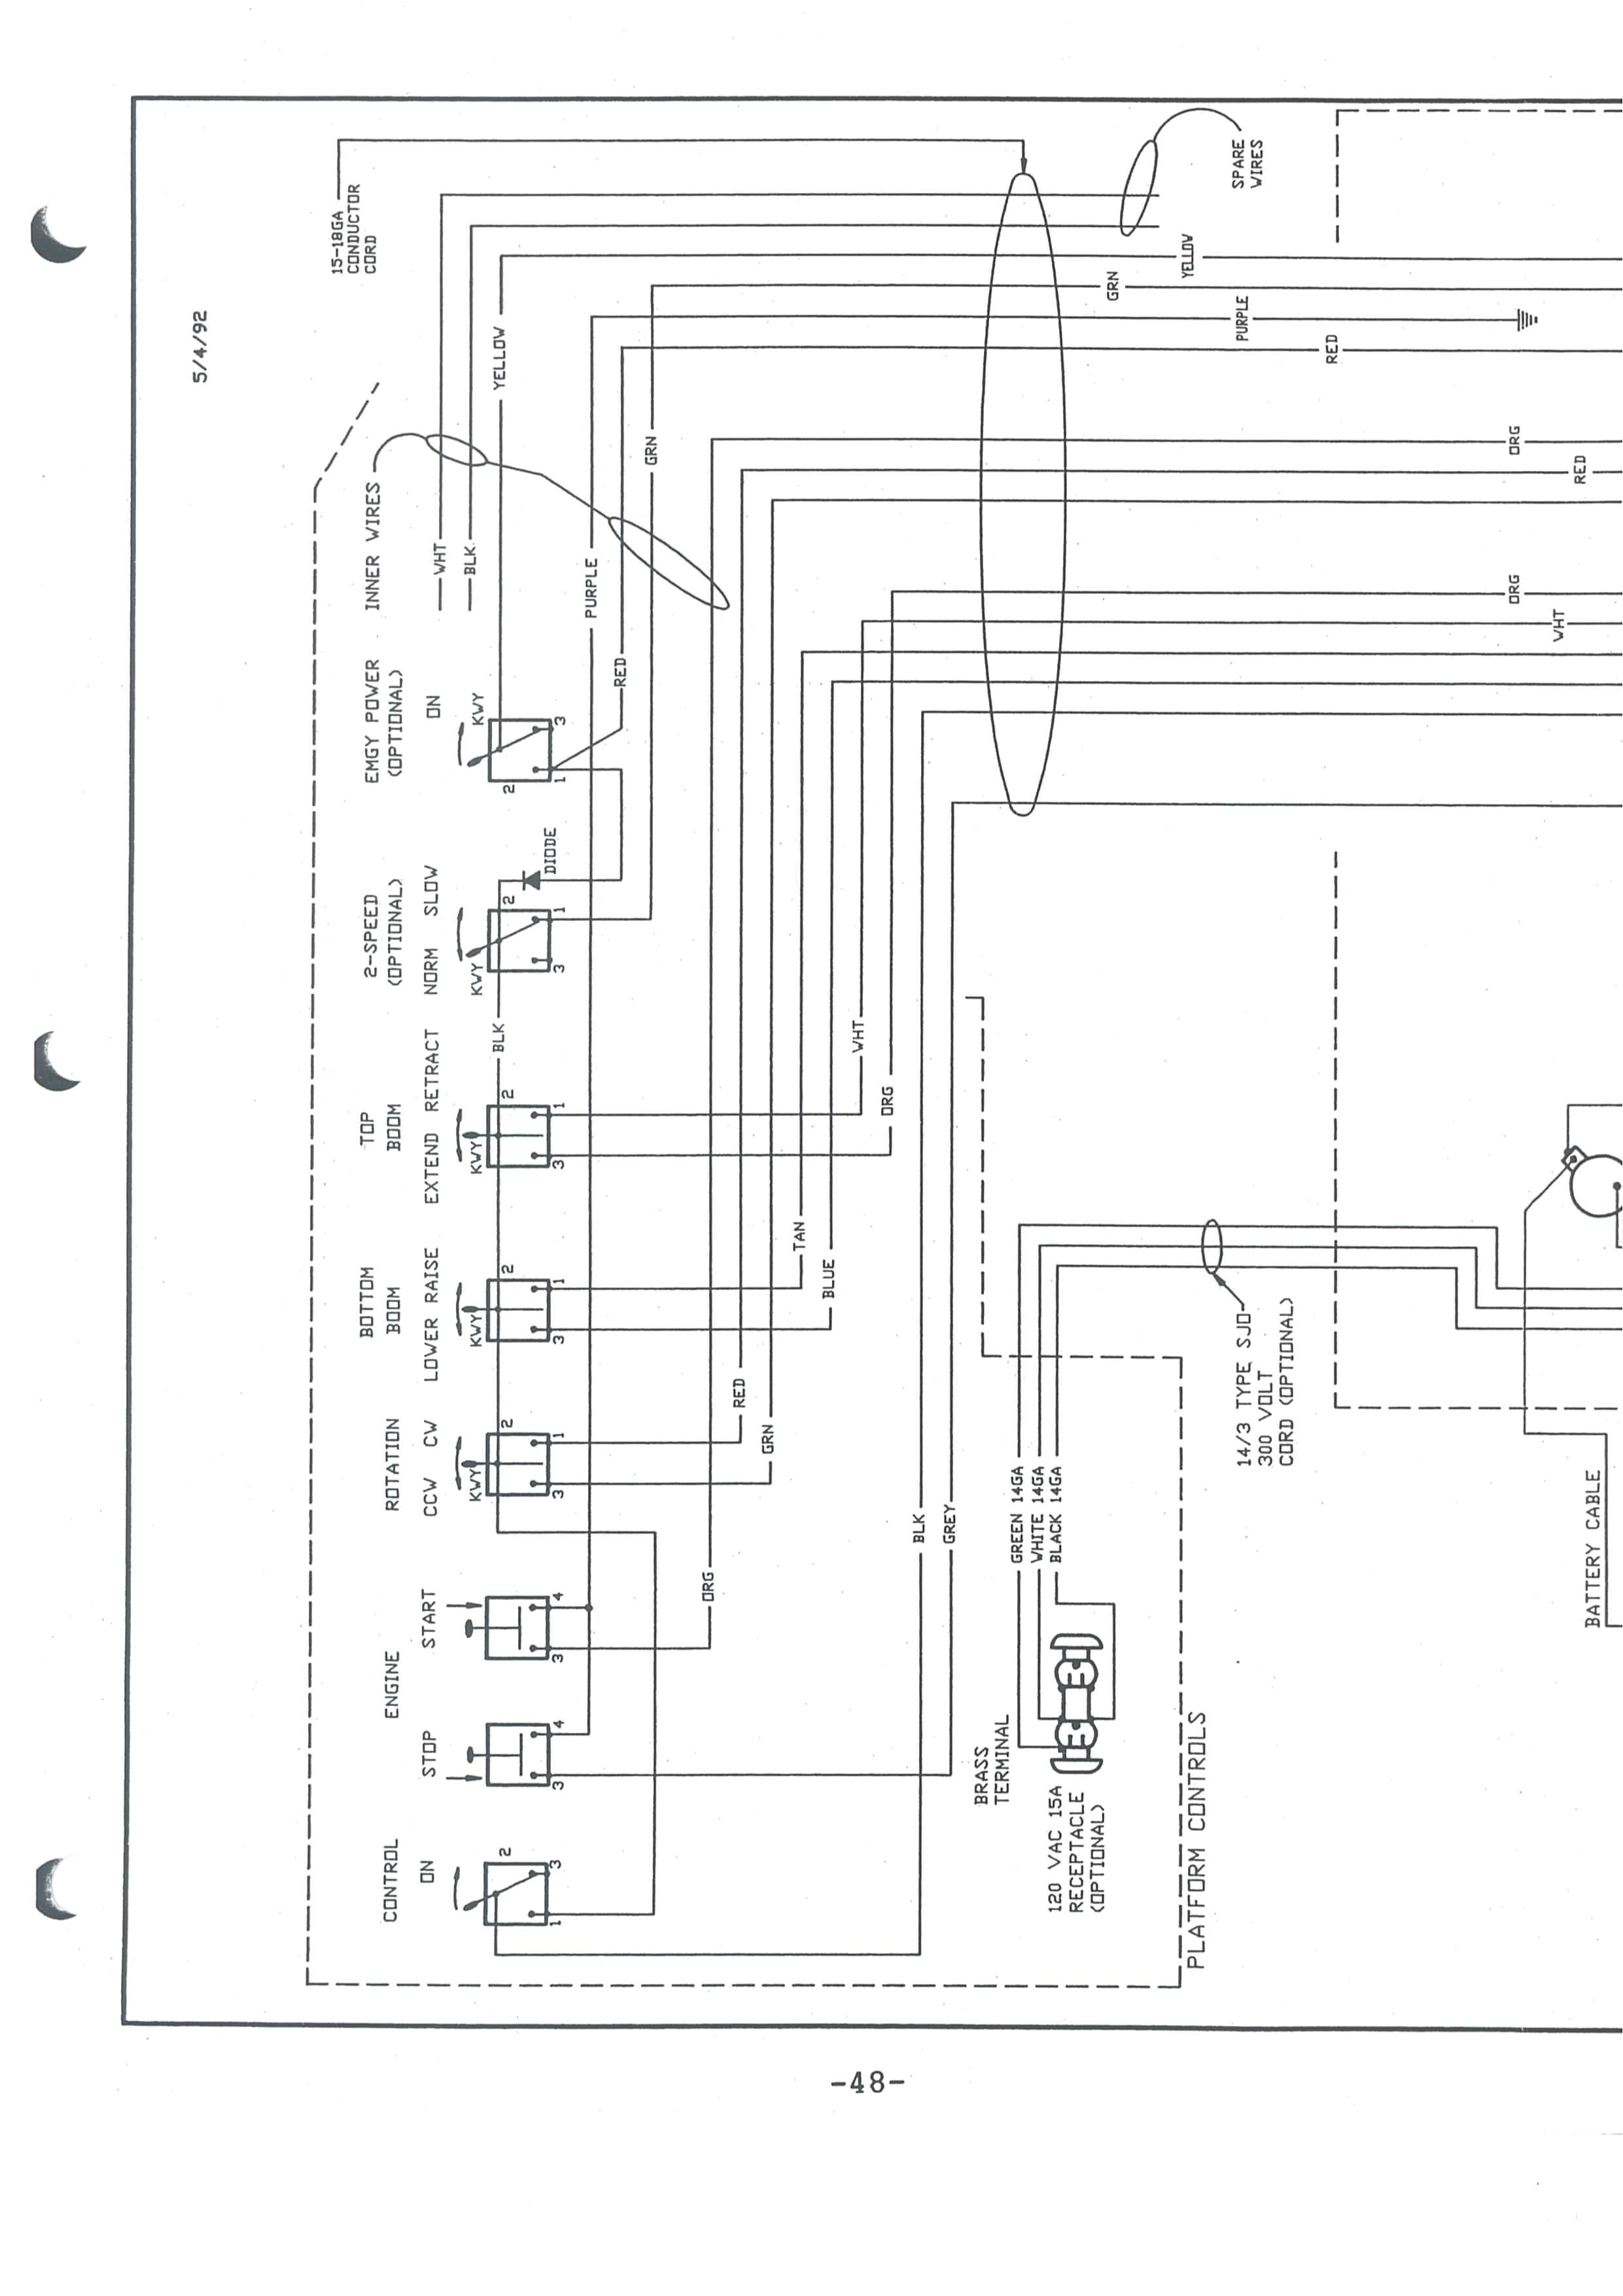 Telsta Bucket Truck Wiring Diagram Altec Hydraulic Lift Diagram for Wiring Wiring Diagram